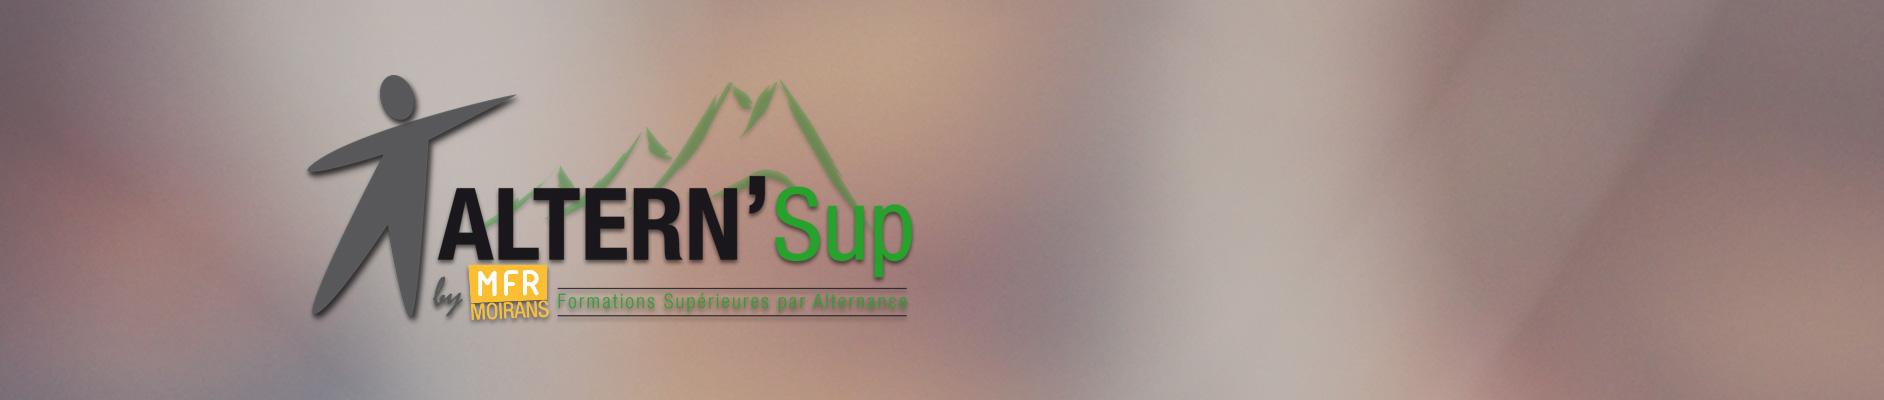 homeslider-Altern-Sup-fond